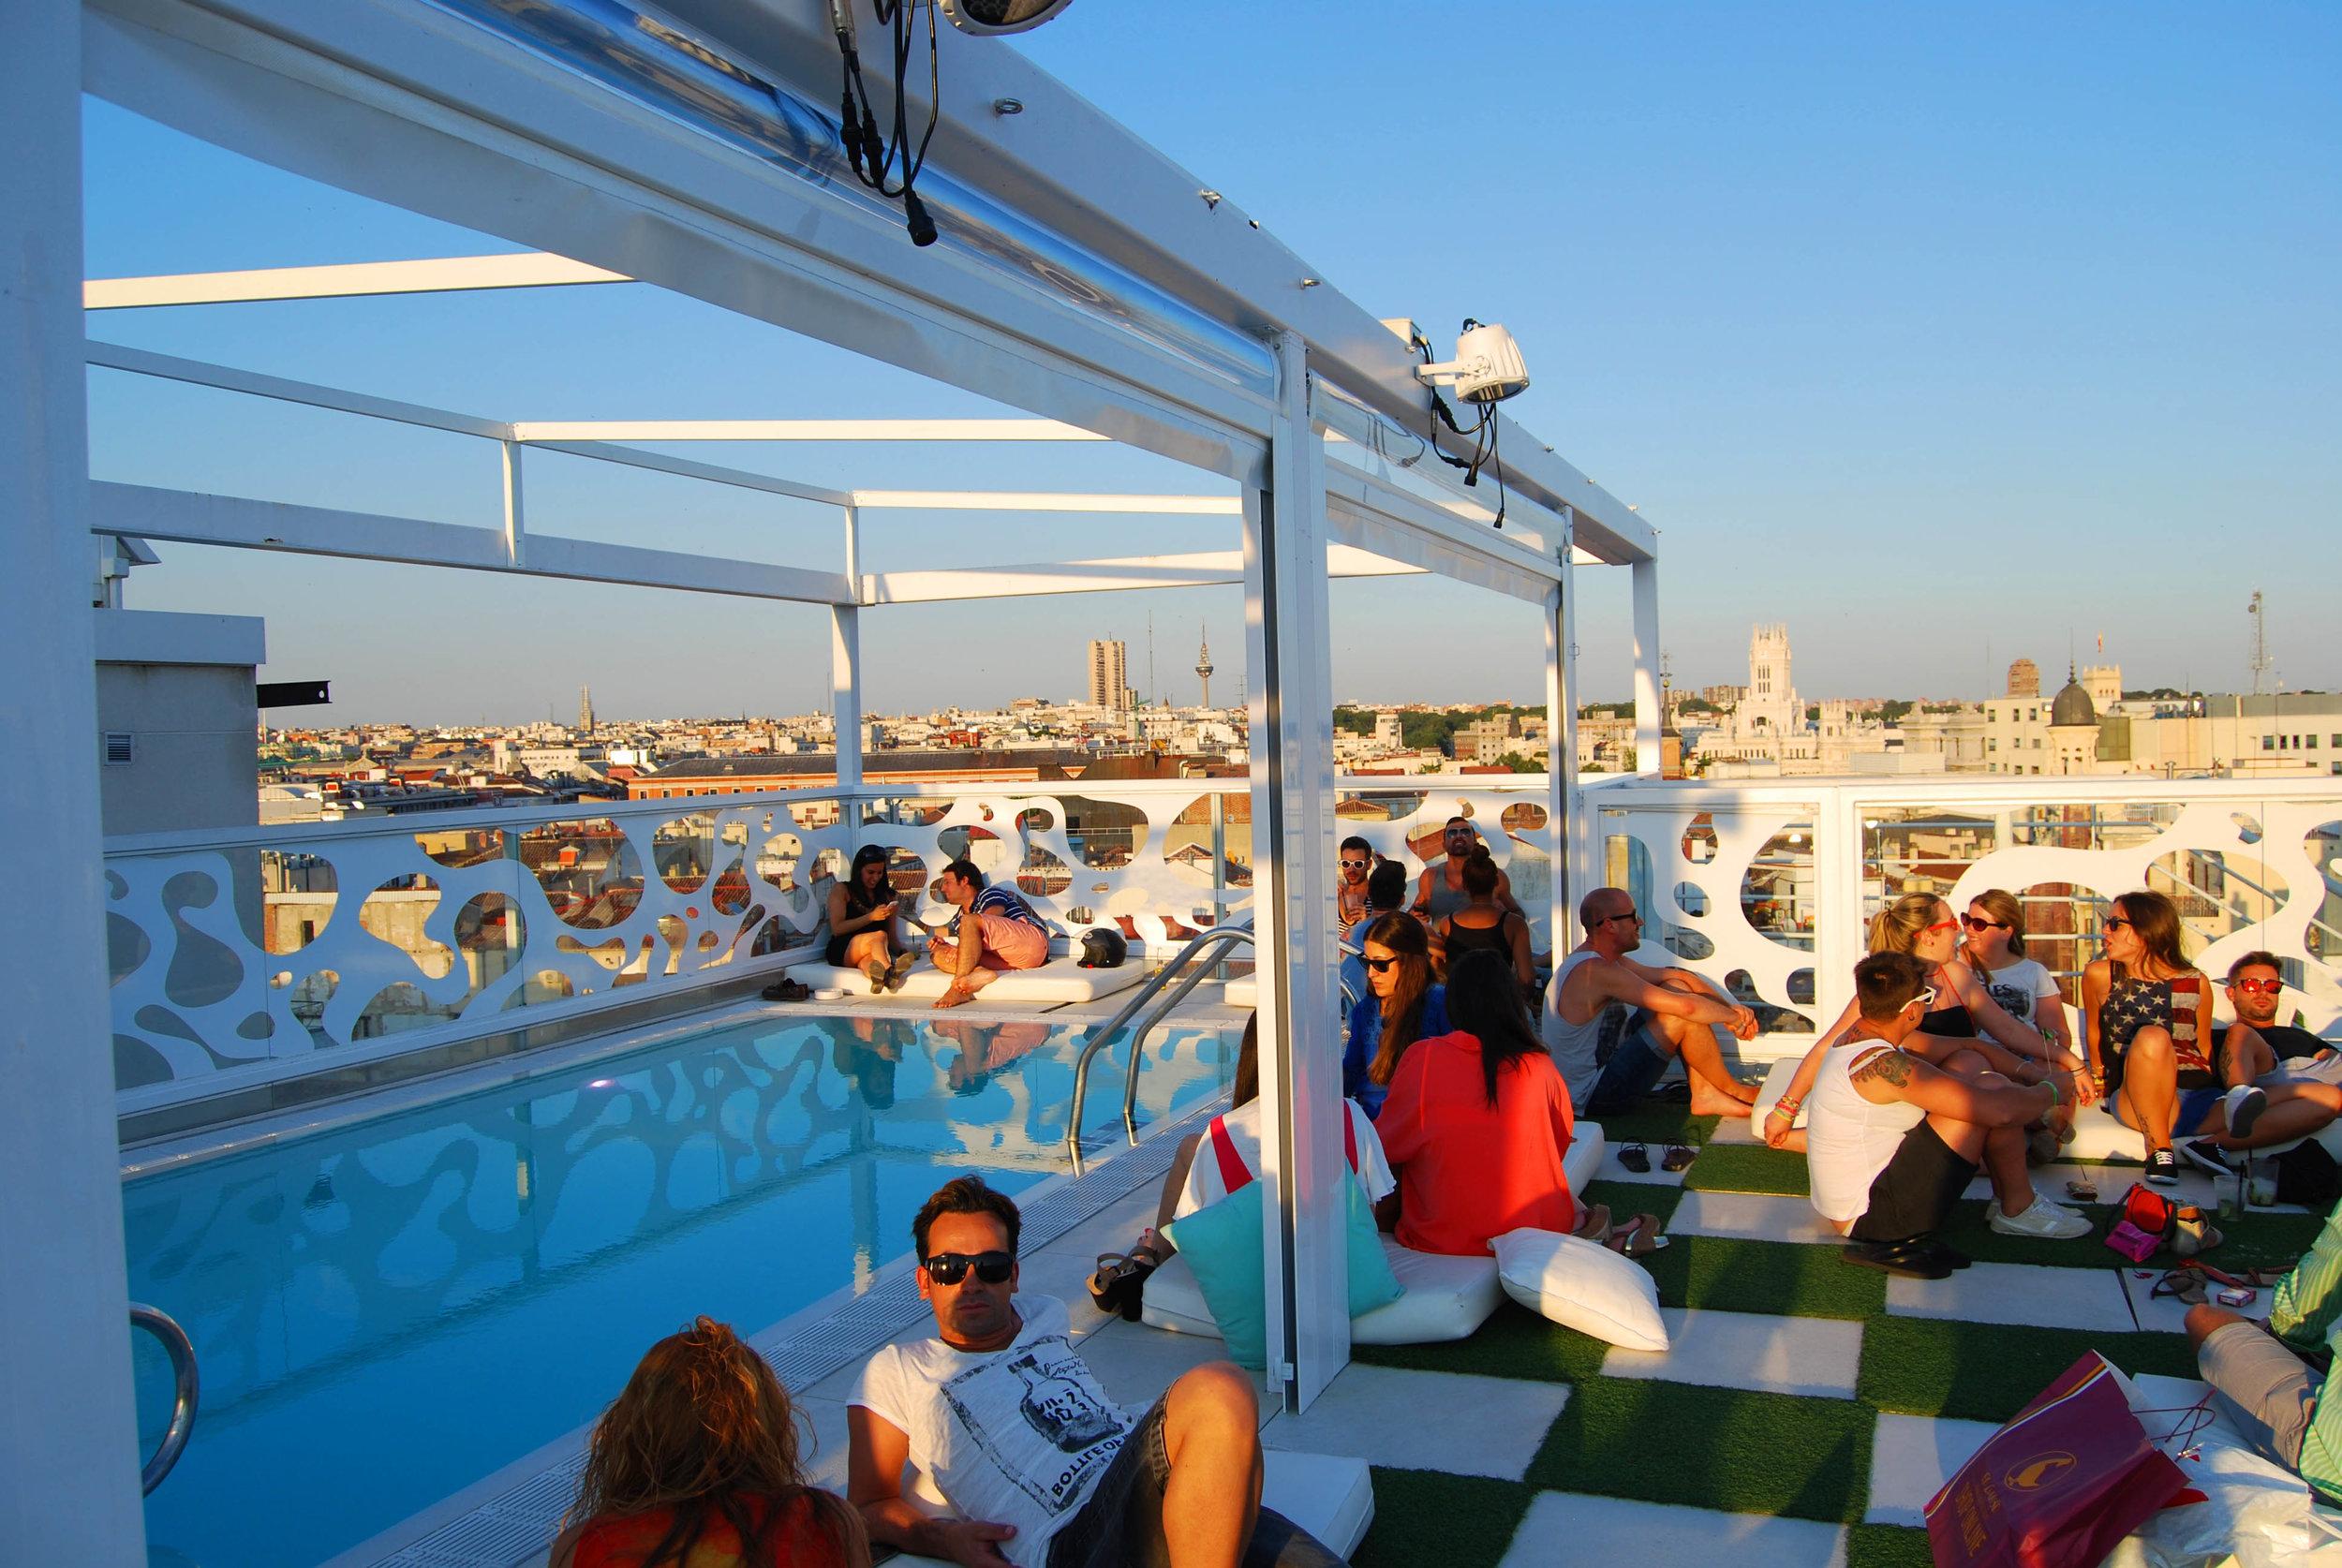 virginia-duran-blog-best-rooftops-of-madrid-room-mate-oscar-hotel-2.jpg